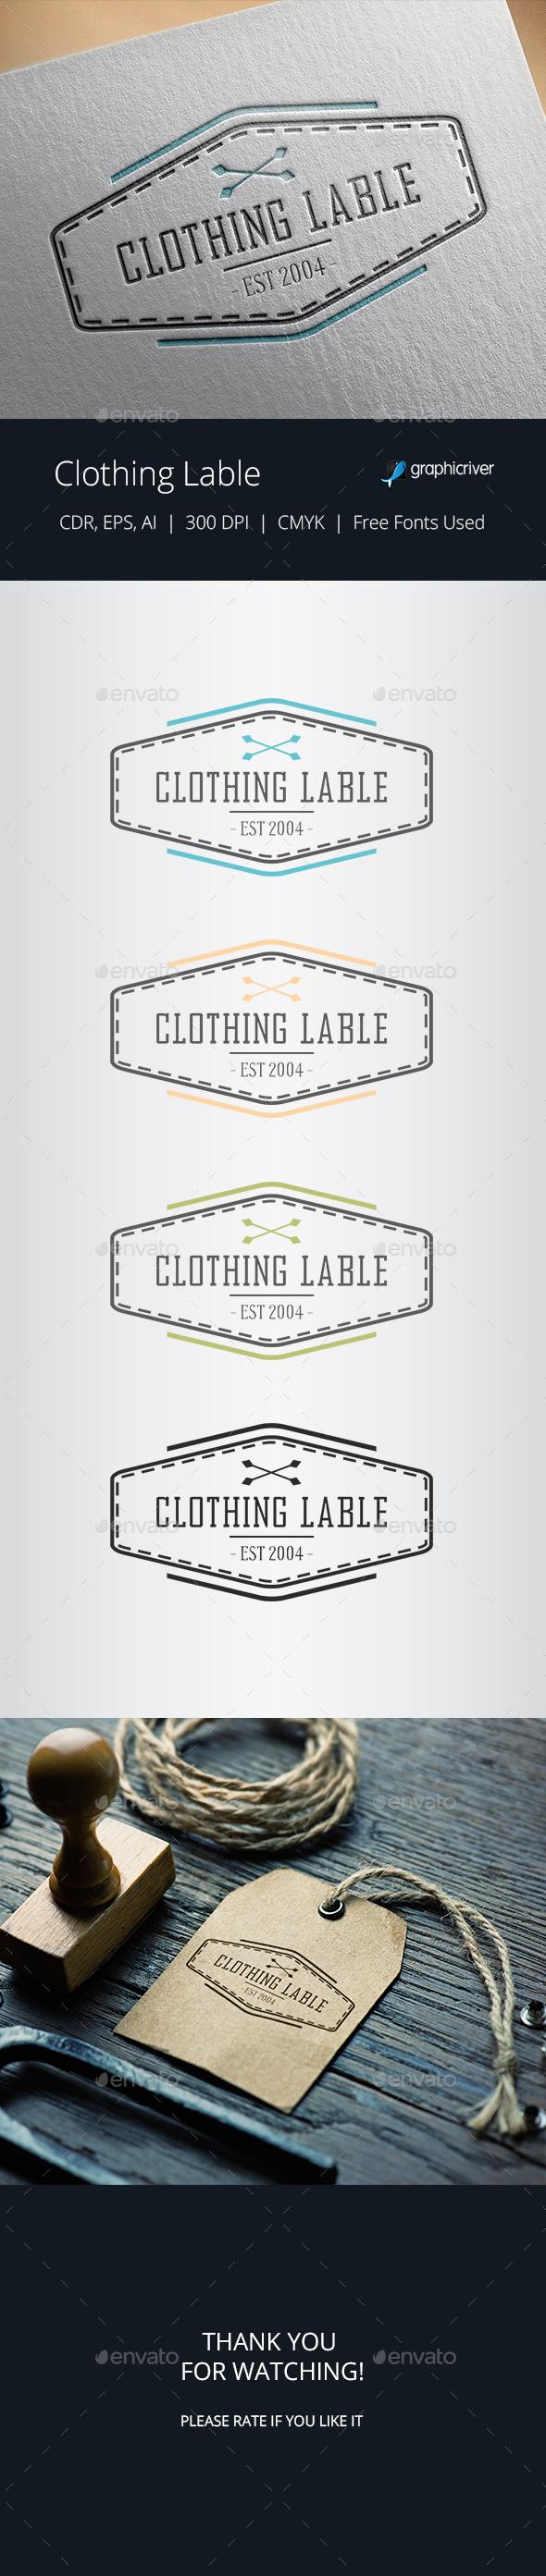 Vintage Vector Badge / Clothing Label - Badges & Stickers Web Elements